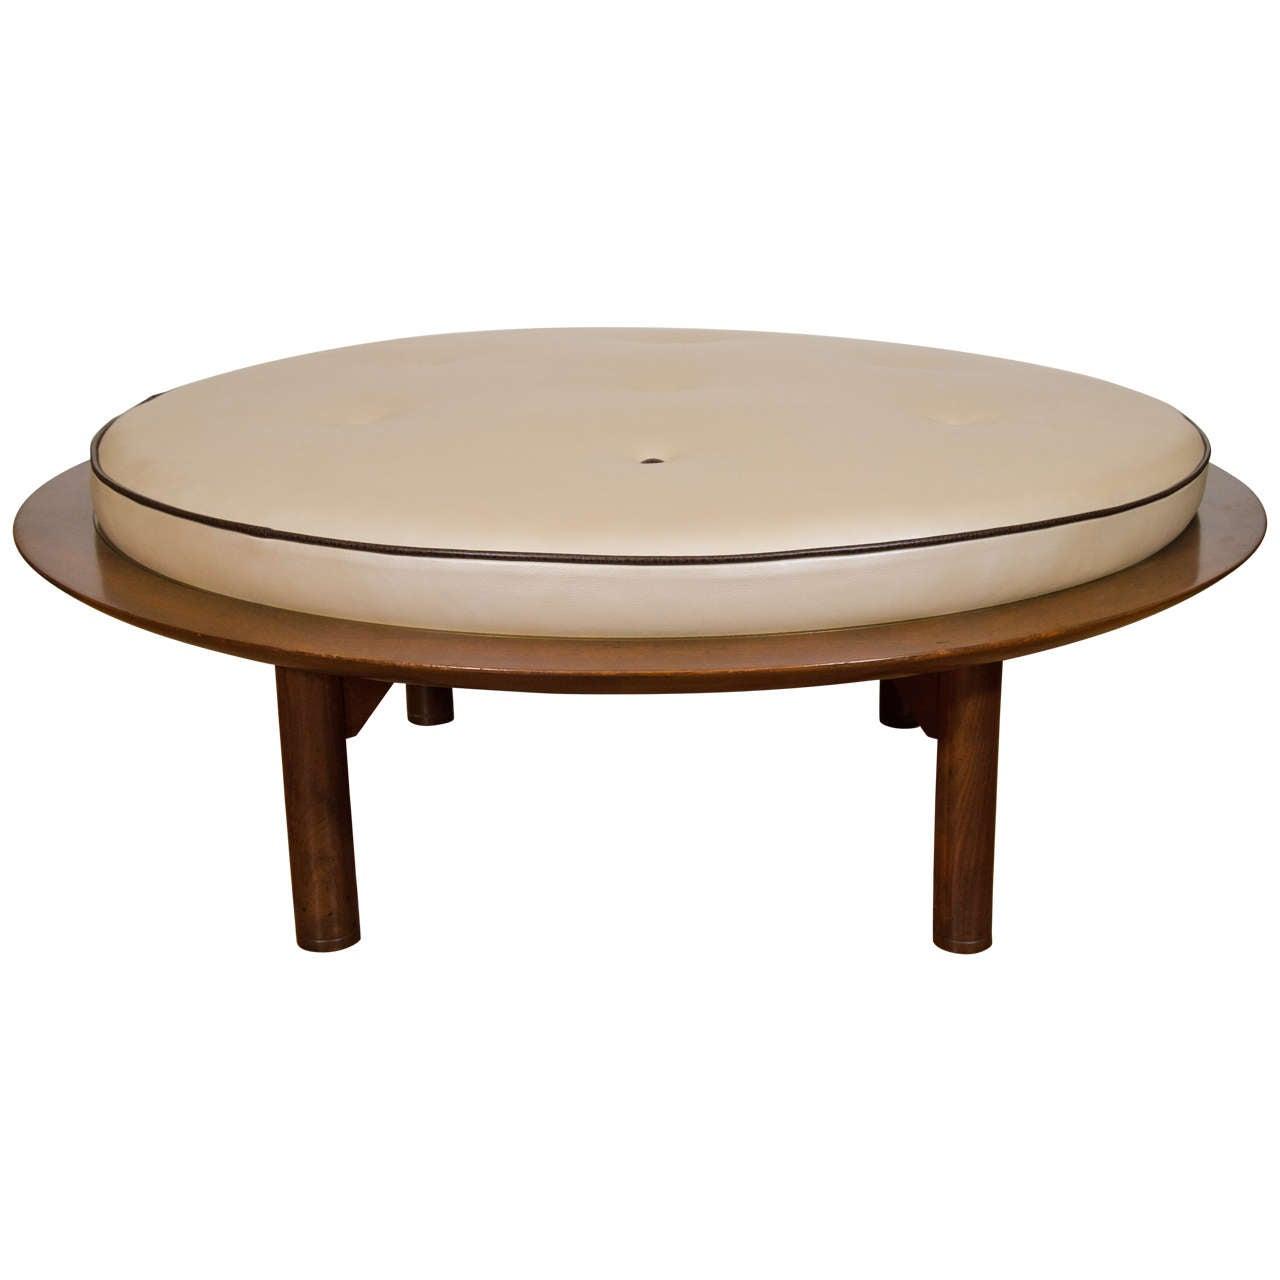 Mid century danish modern round leather and wood ottoman